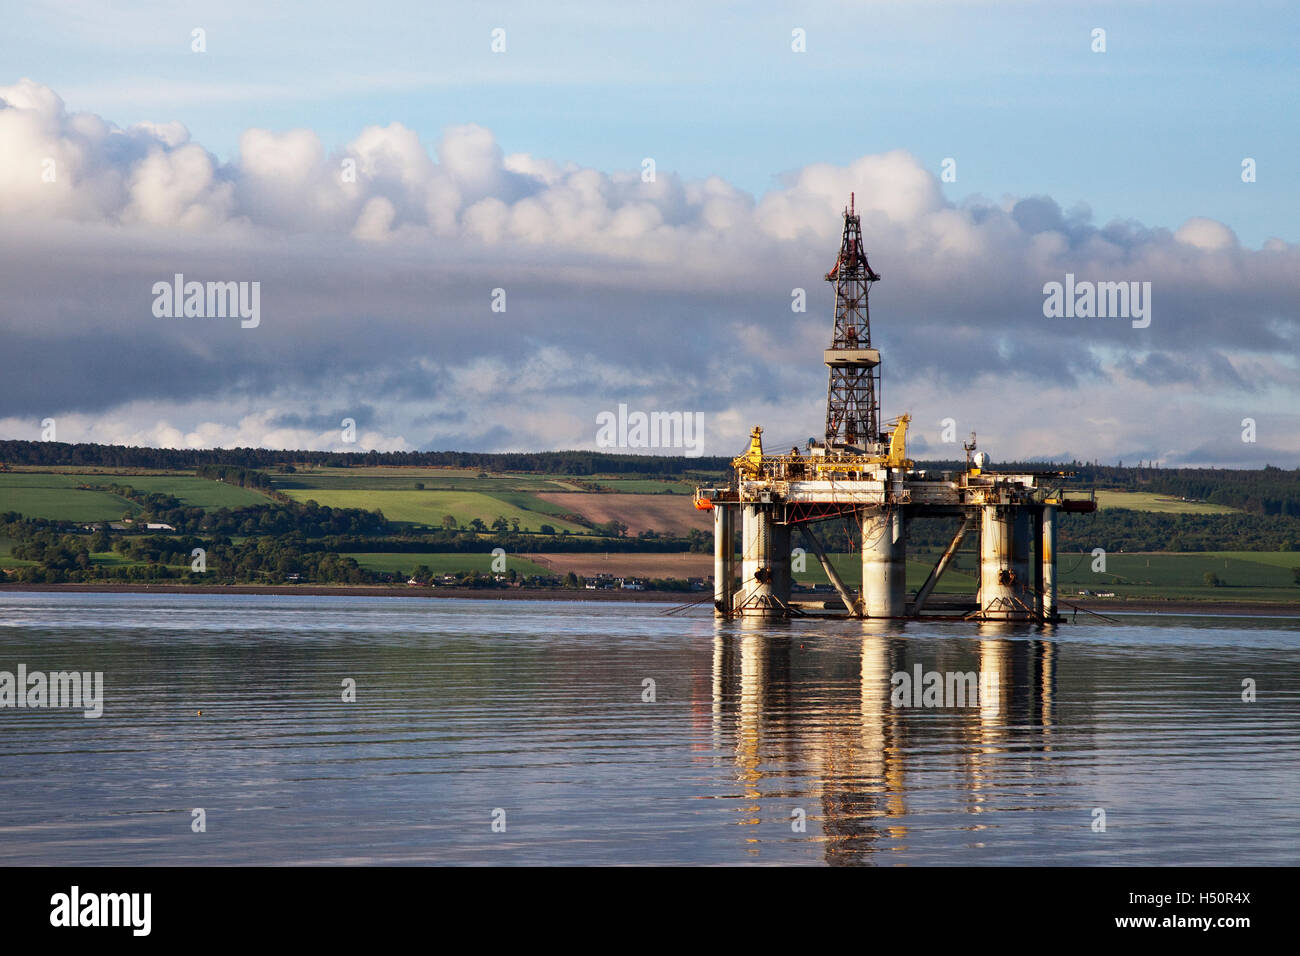 GSF ARCTIC II, Artic, Oil Rig platform vessel in Cromarty Firth, port of Invergordon, Scotland - Stock Image